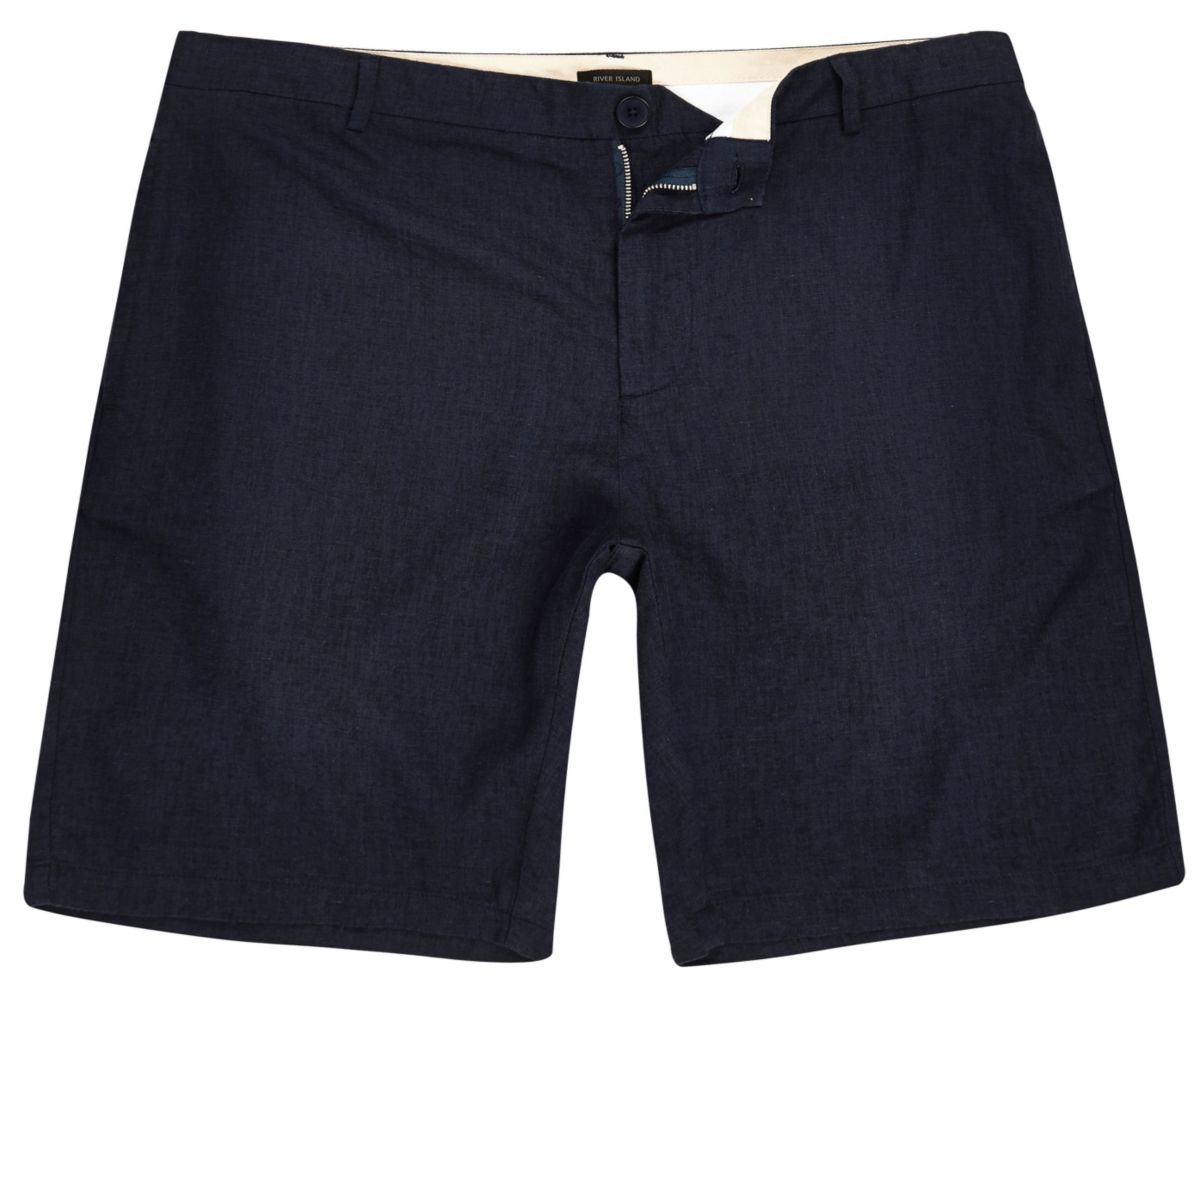 Navy linen slim fit chino shorts